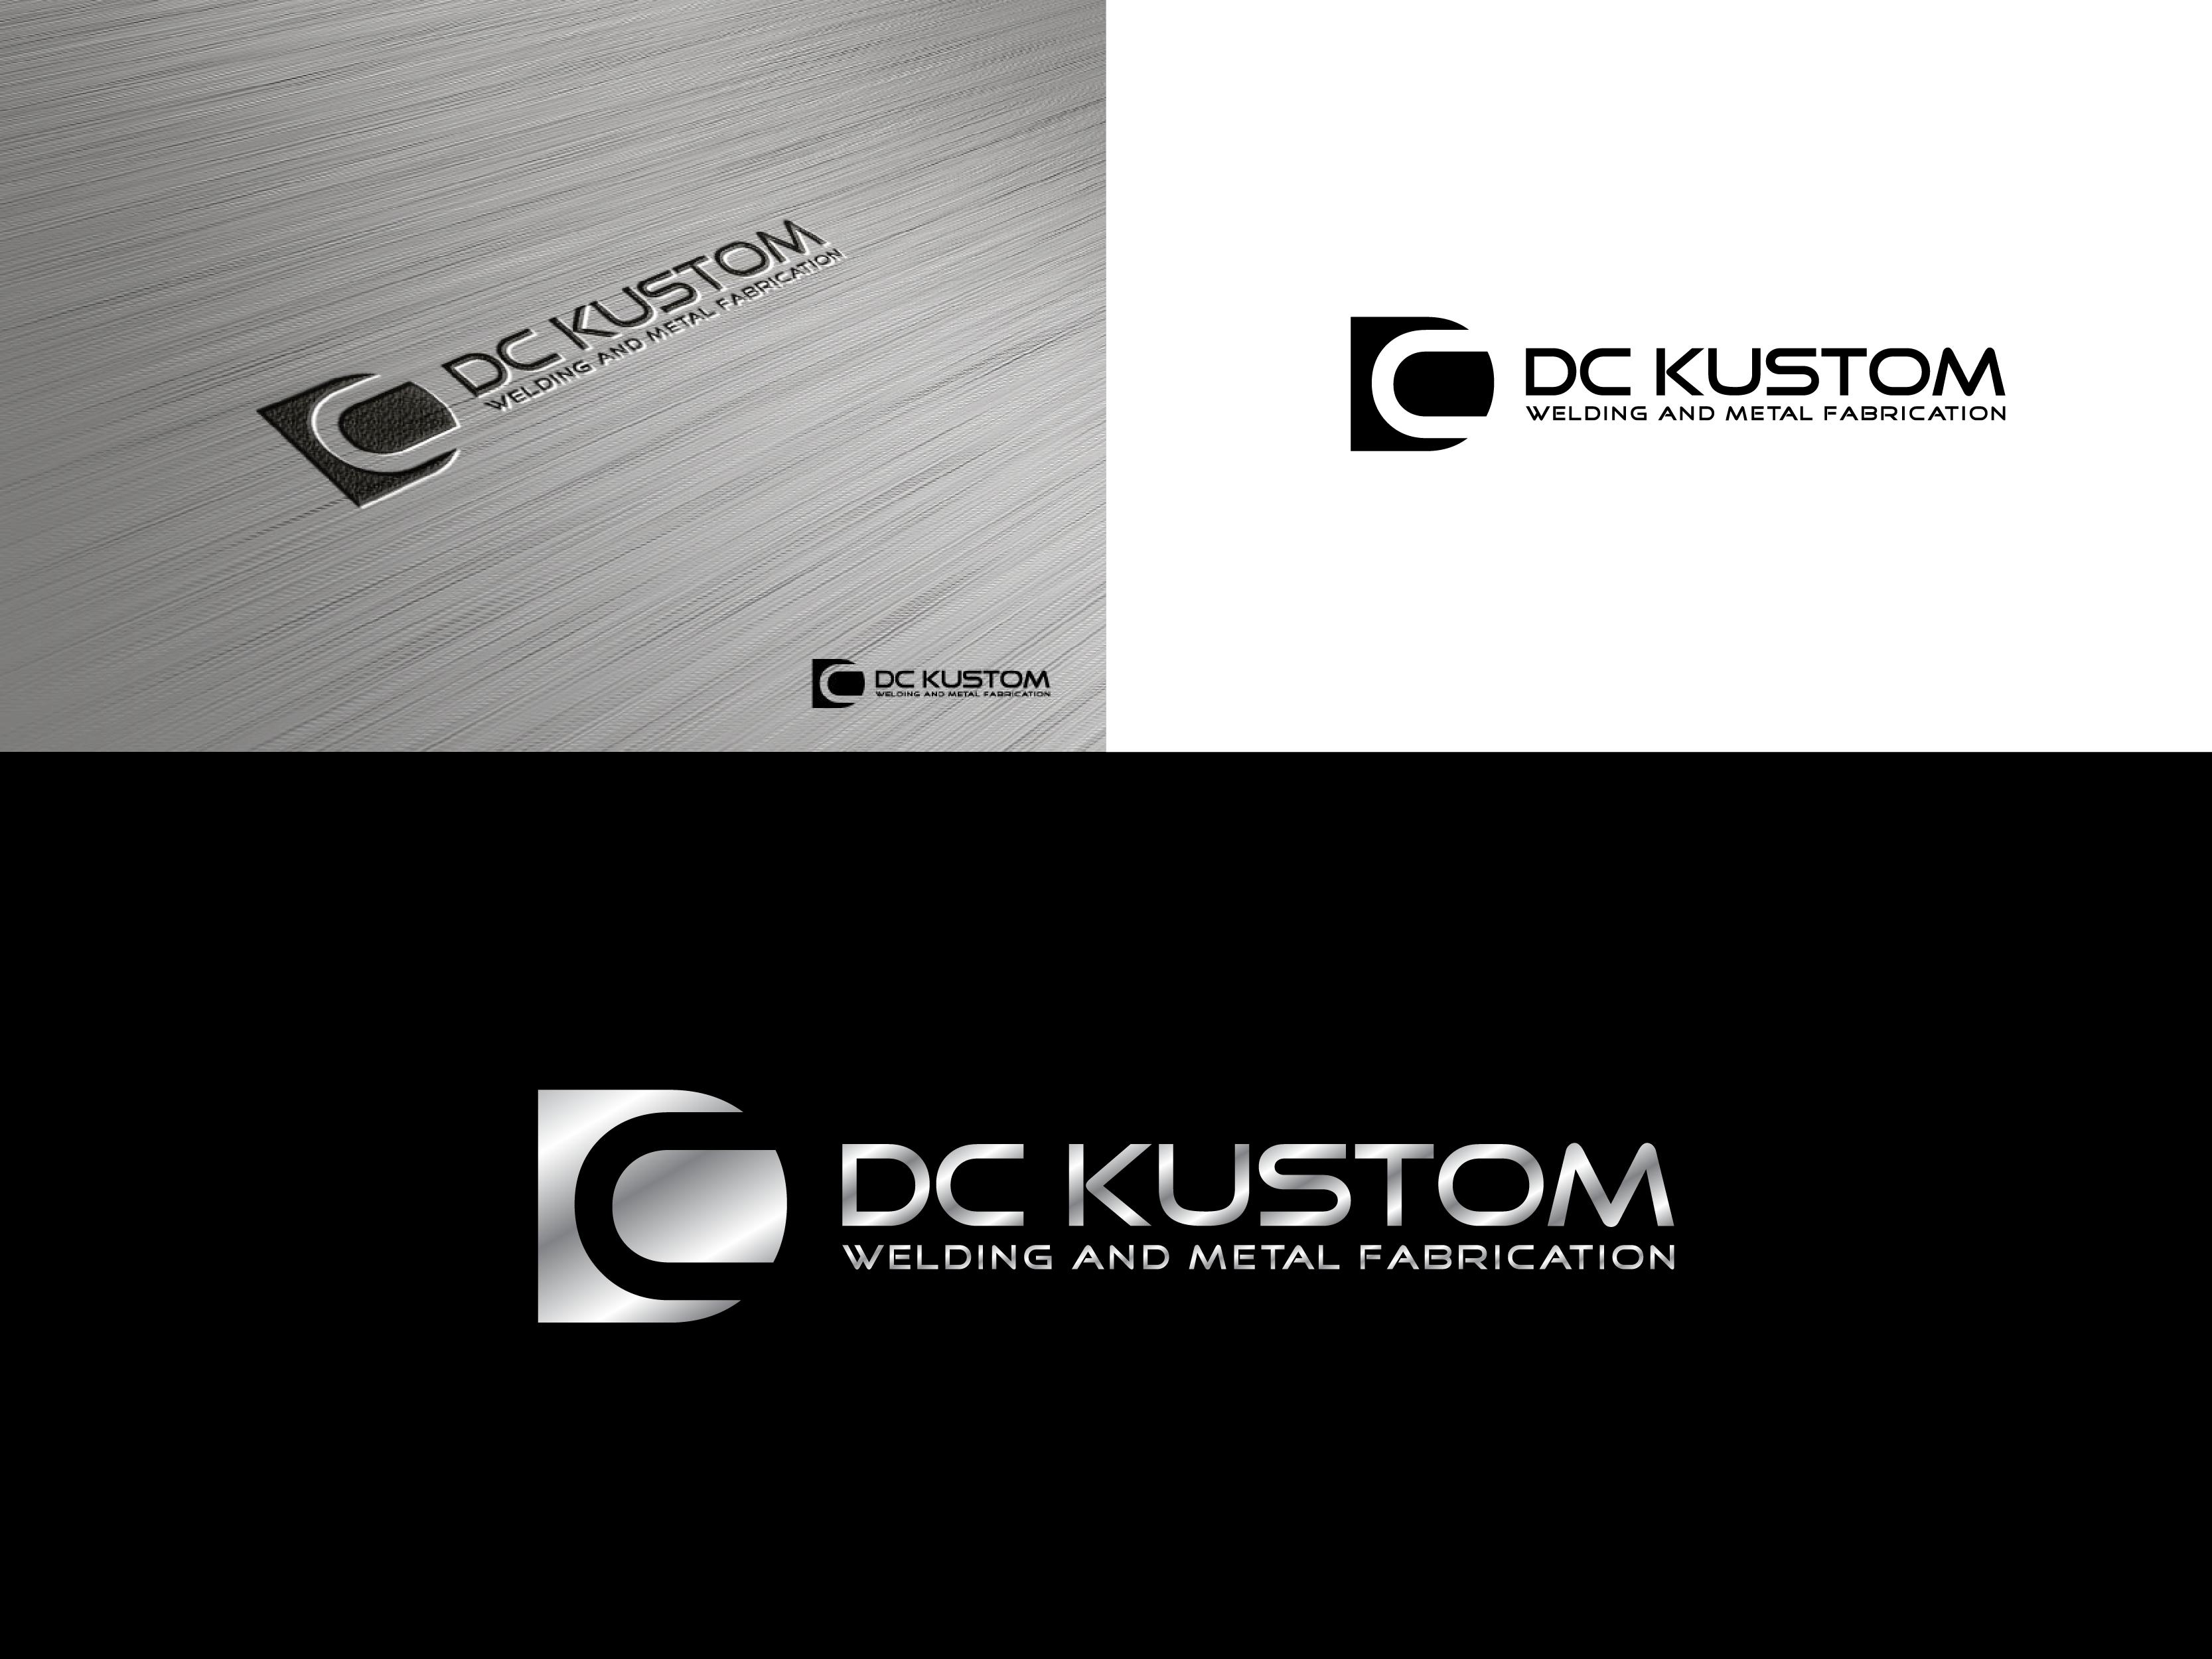 Logo Design by Shivaprasad Sangondimath - Entry No. 58 in the Logo Design Contest Imaginative Logo Design for DC KUSTOM WELDING & METAL FABRICATION.